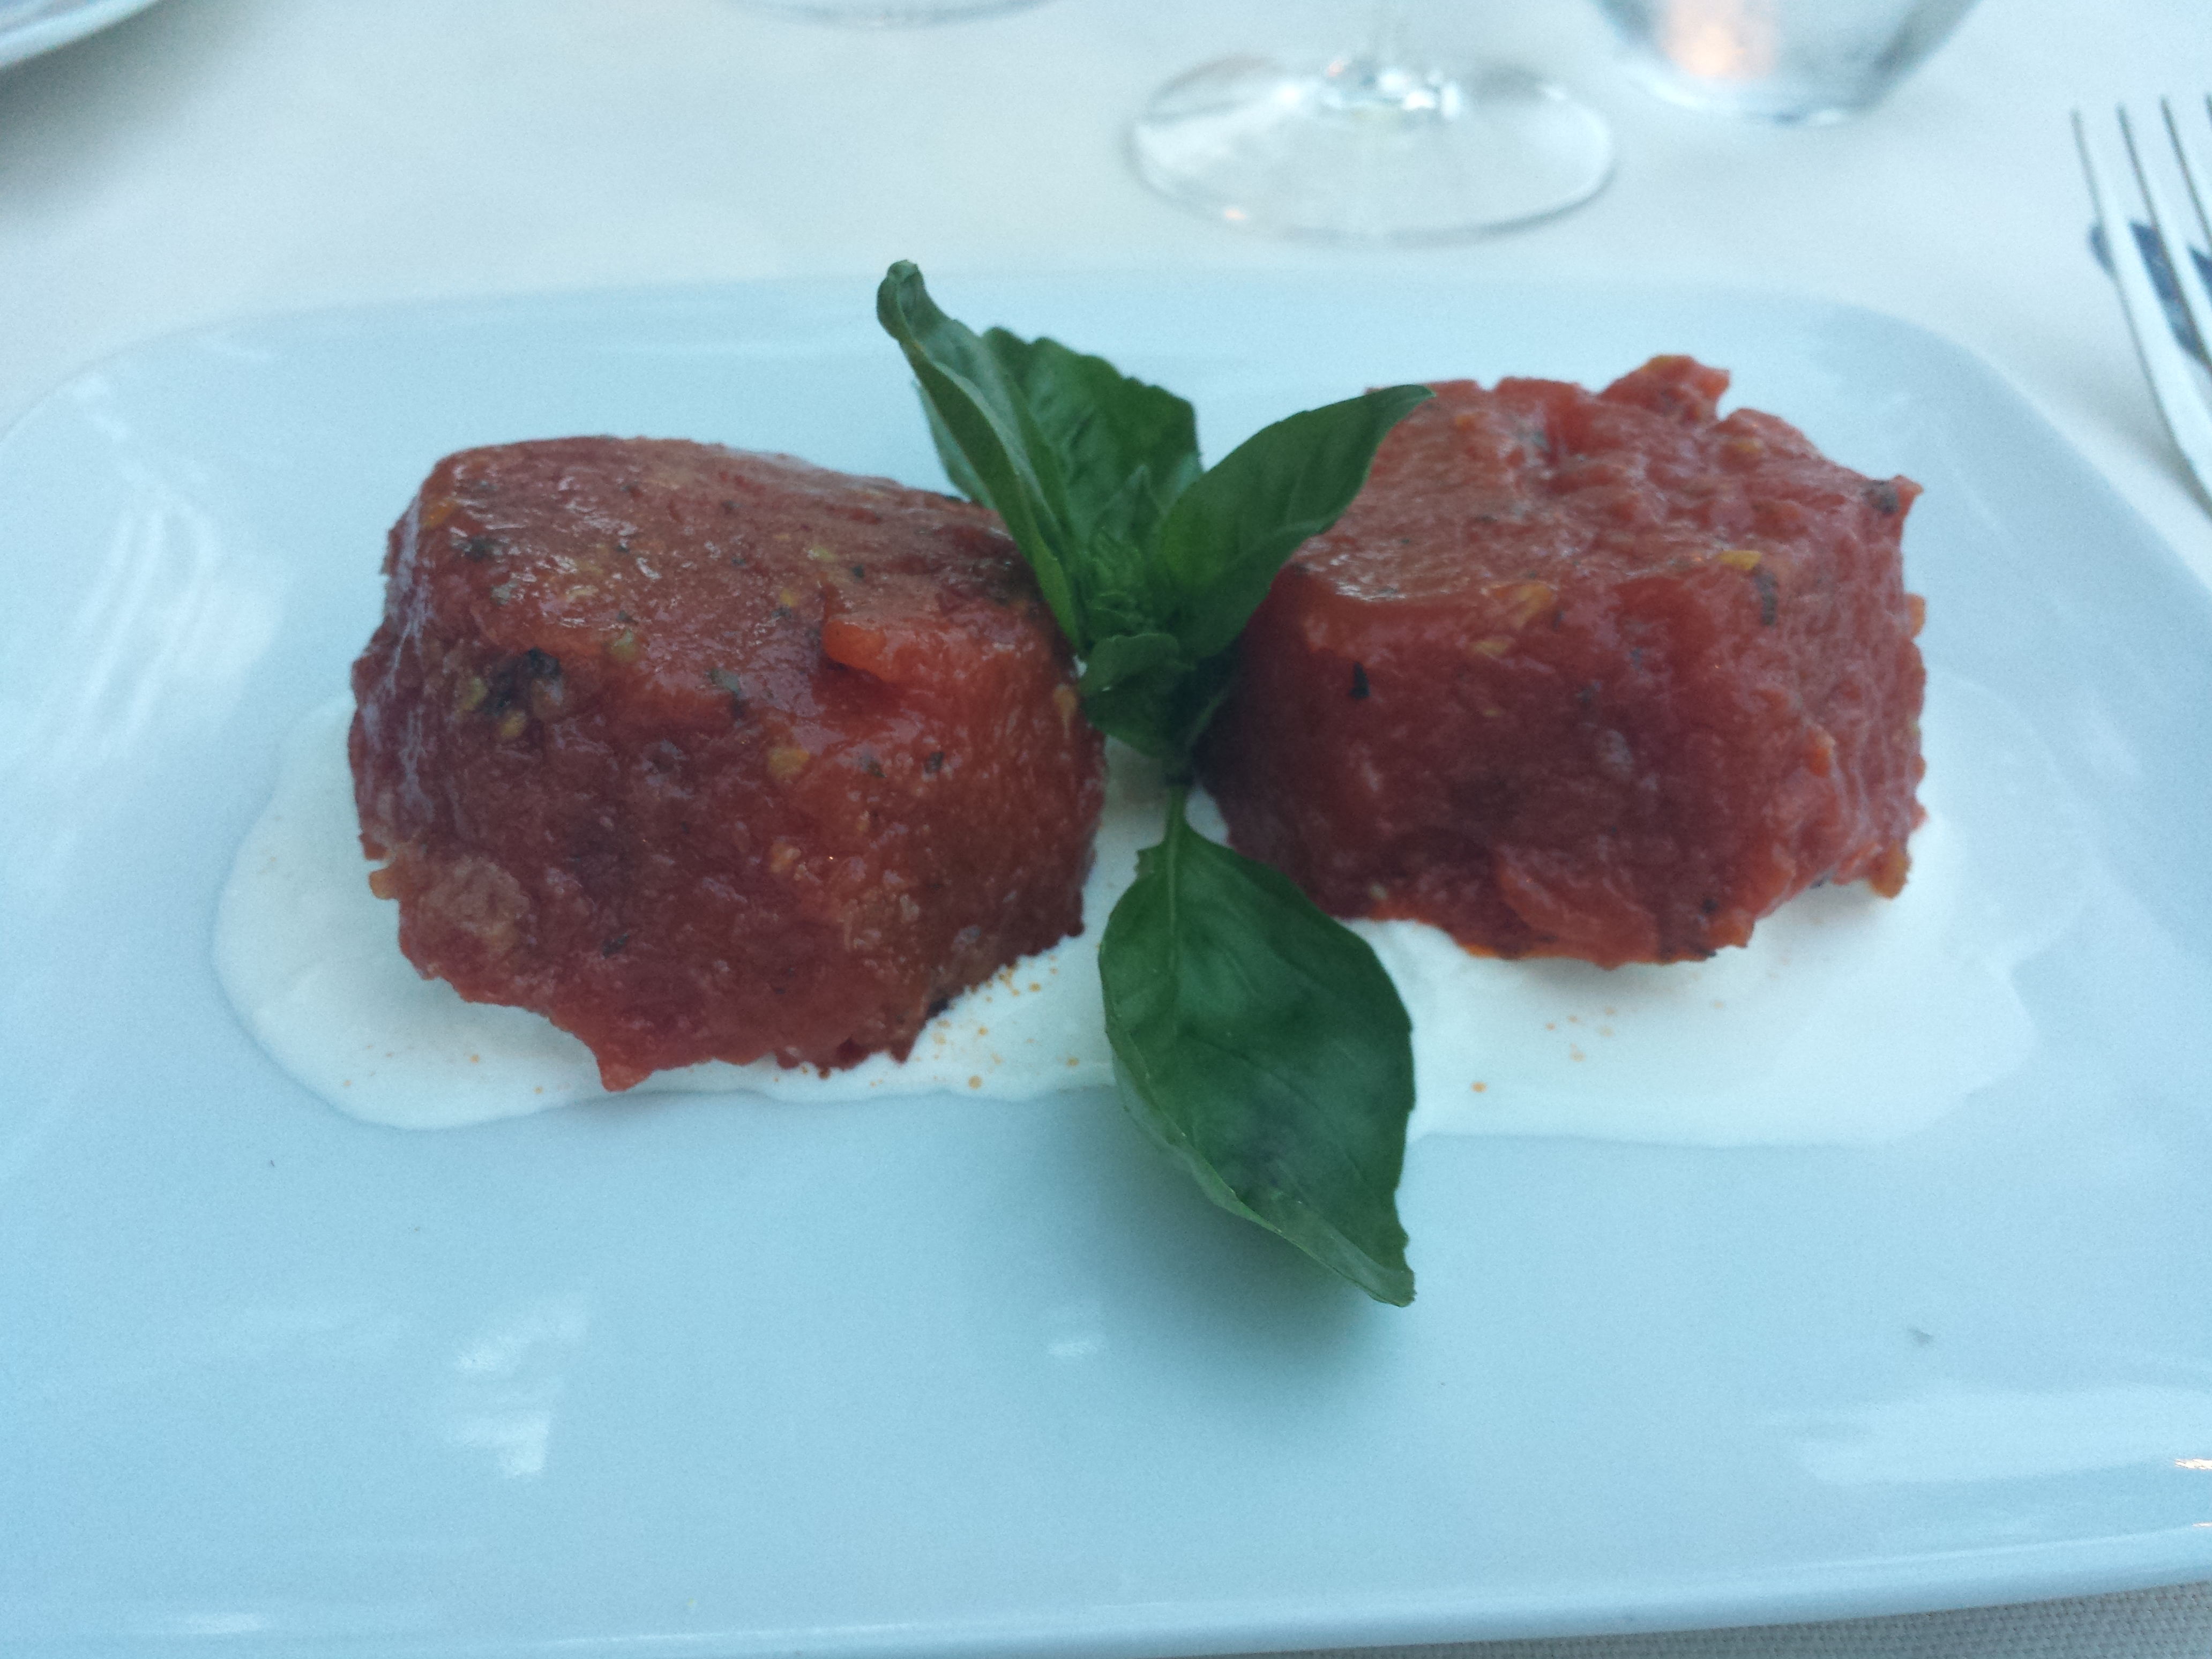 ristorante terra antica bologna food - photo#48